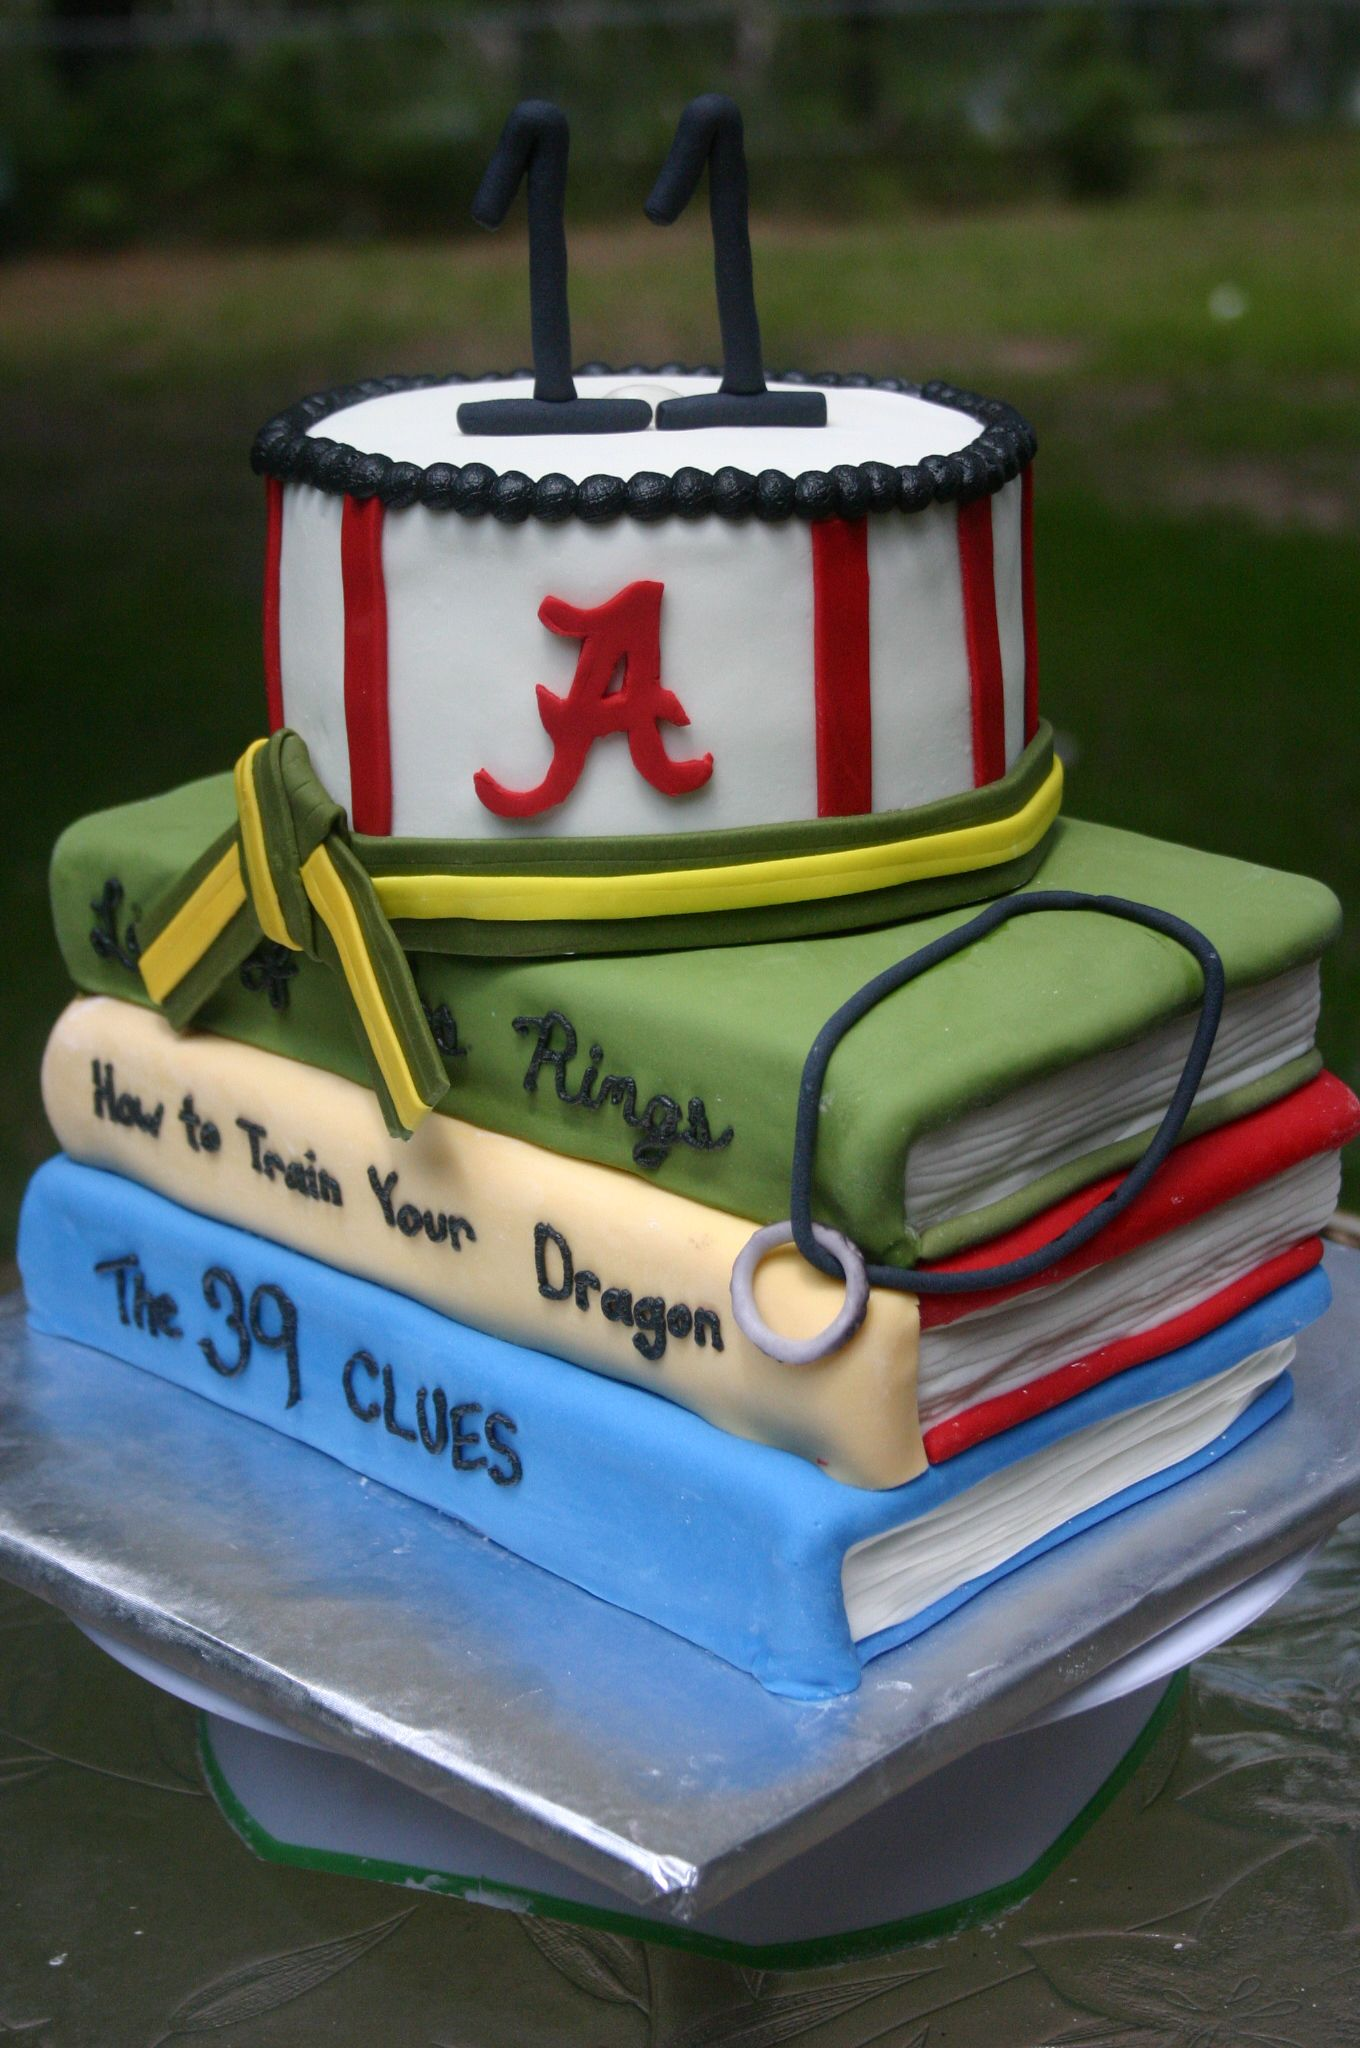 39 Clues Cake Idea Also She Loves Books Saras Birthday